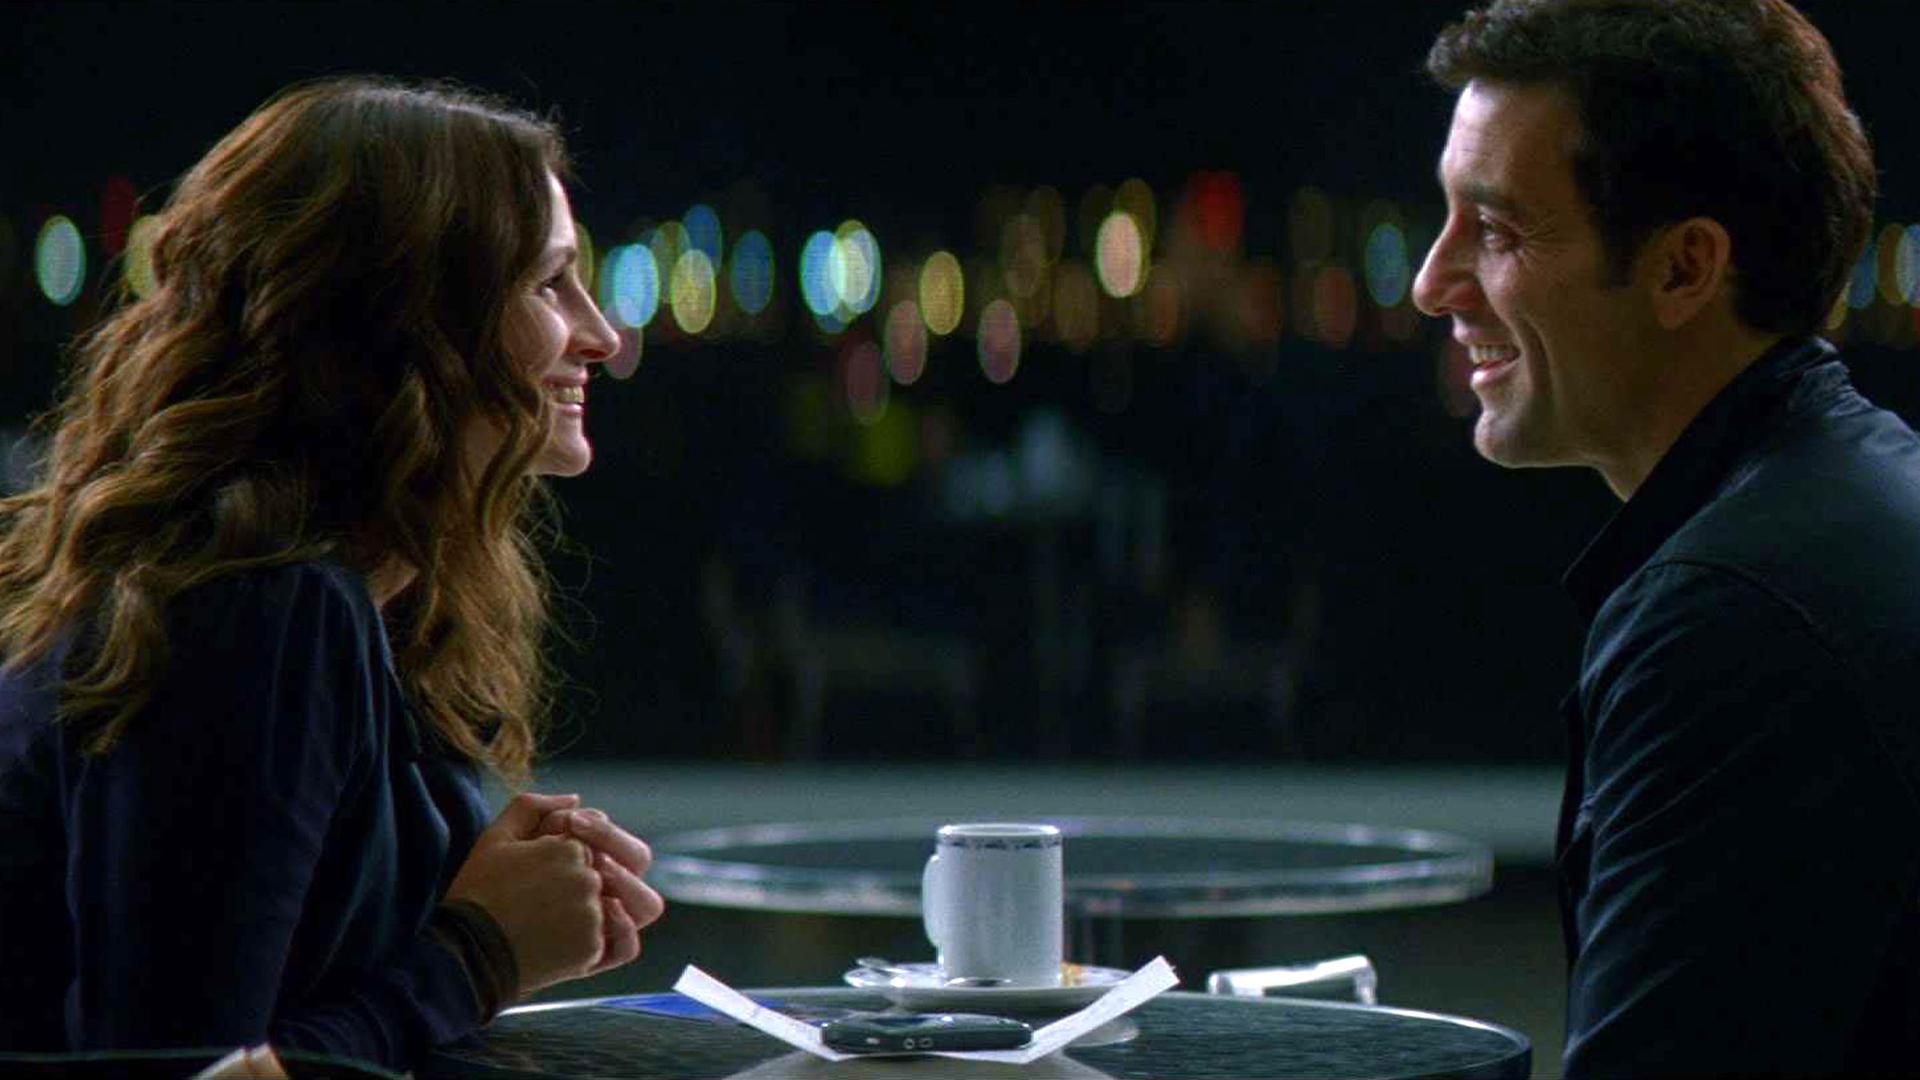 Singletreff kostenlos in regau. Single urlaub in gtzis - Dating